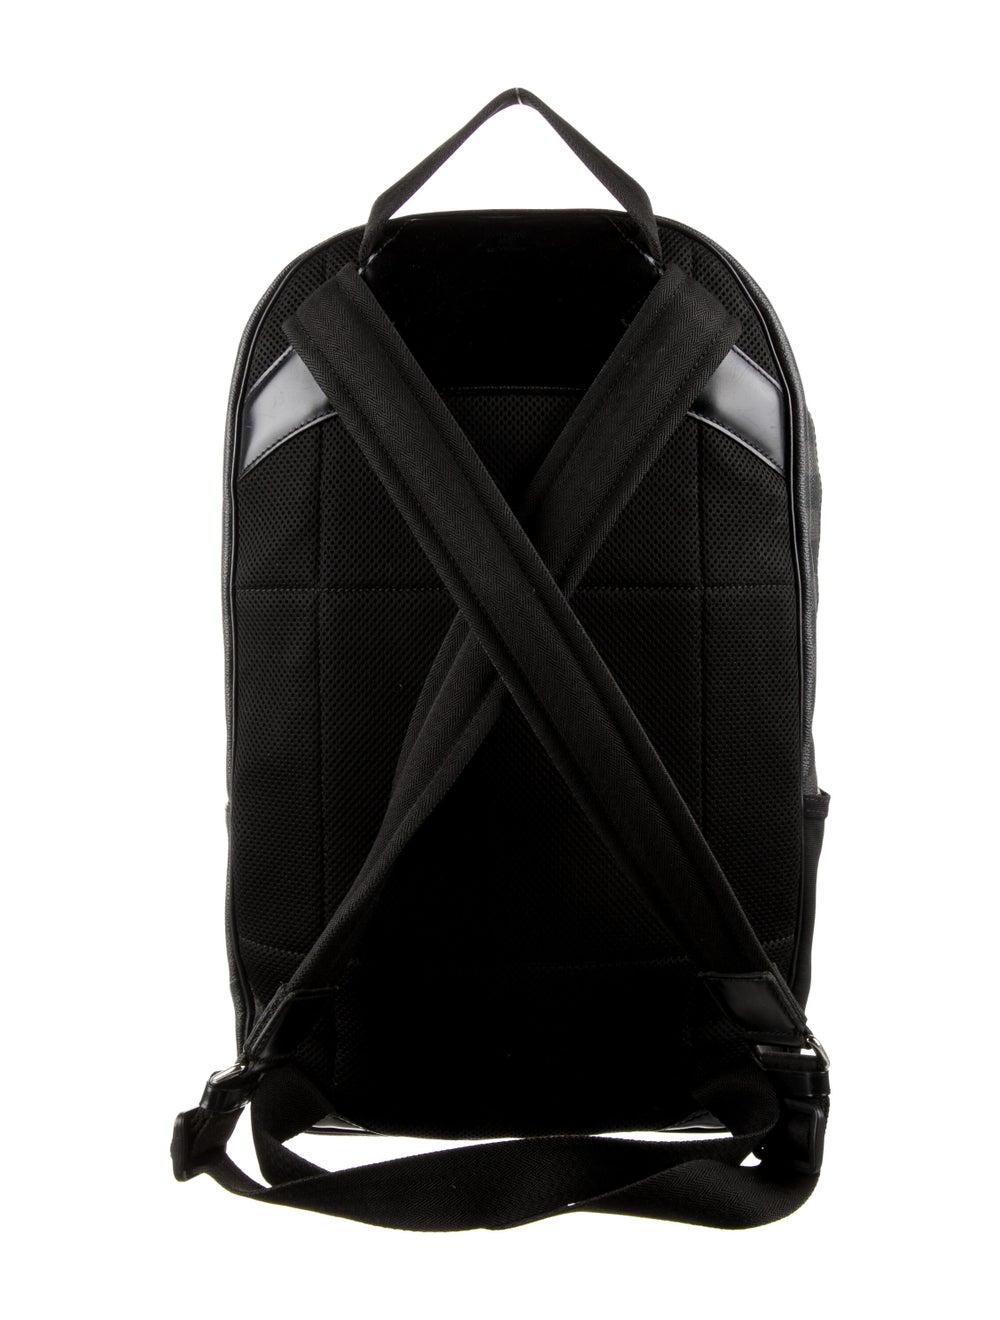 Louis Vuitton Damier Graphite Michael Backpack Gr… - image 4